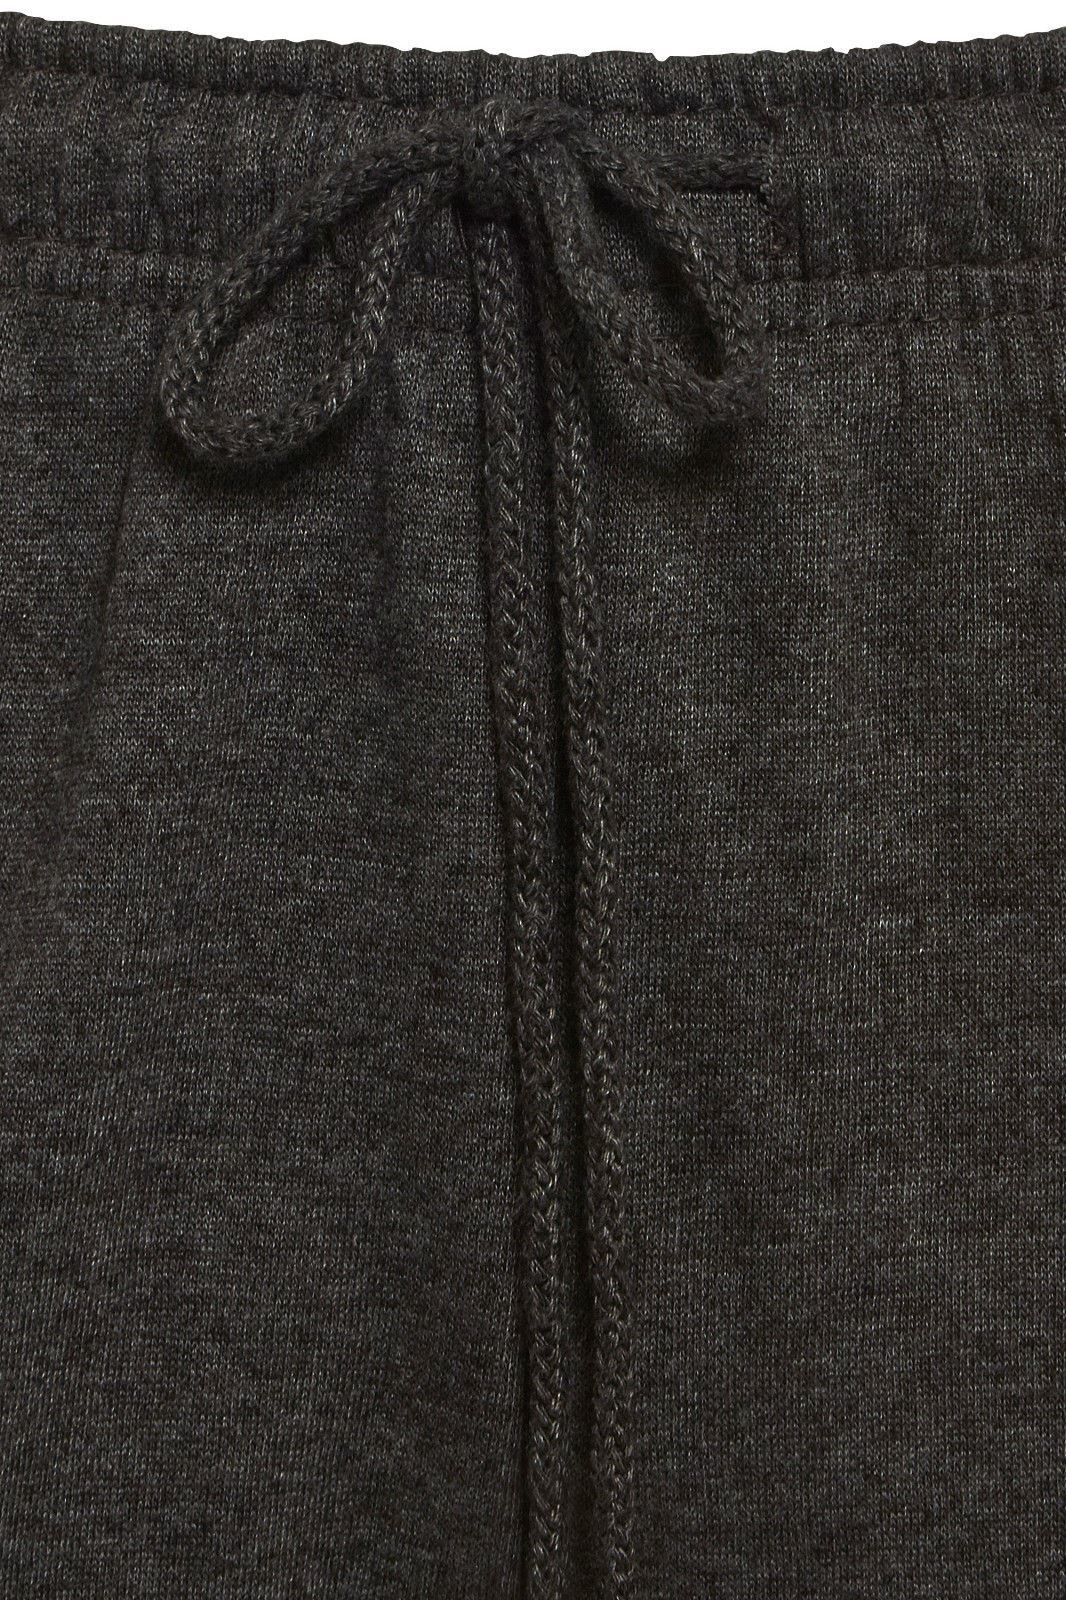 Uomo-Casual-Tinta-Unita-Pantaloni-sportivi-Bottoms-Apri-Hem-Sudore-Pantaloni-Tasche-Con-Zip miniatura 6